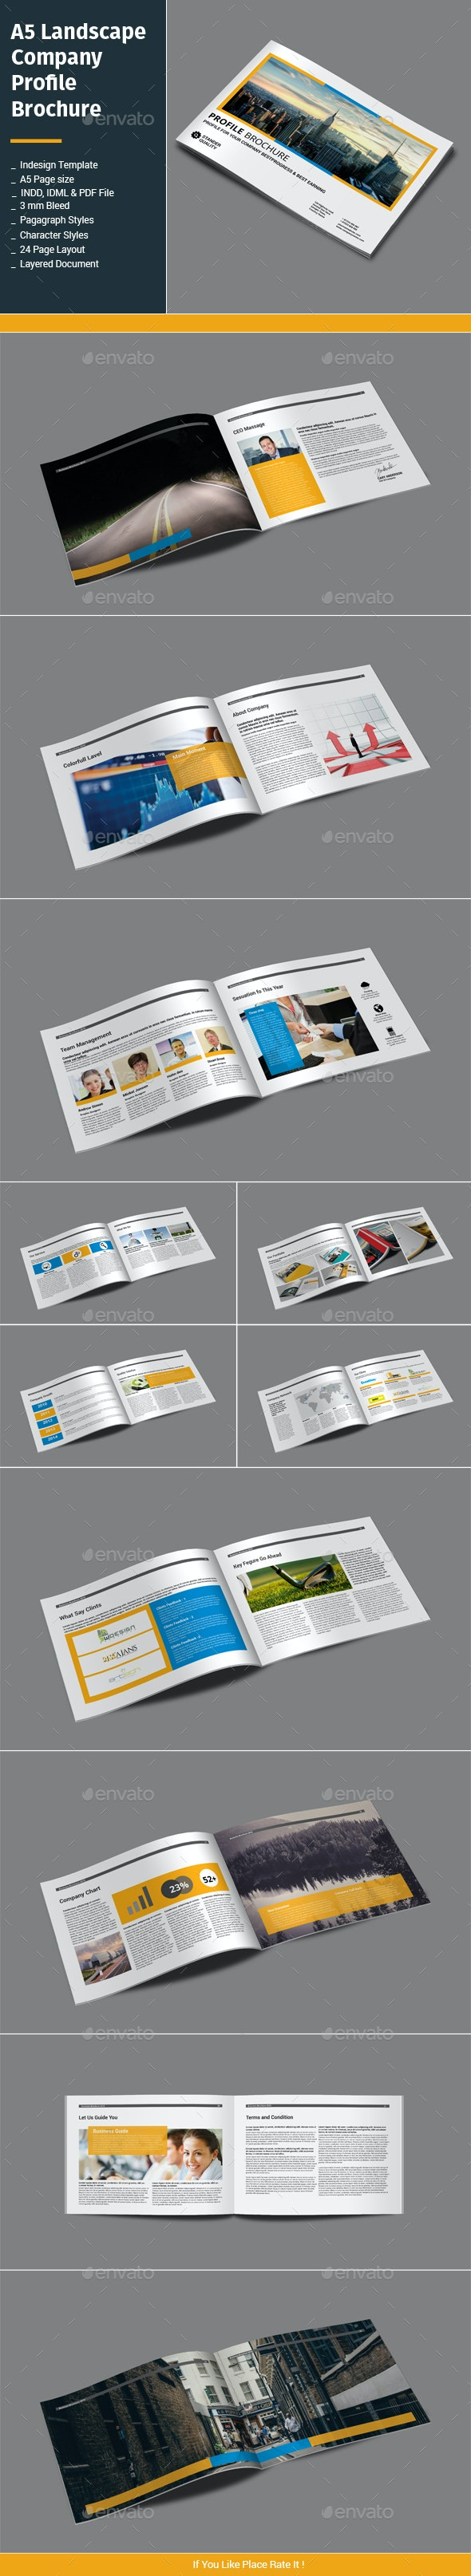 A5 Landscape Company Profile Brochure - Corporate Brochures